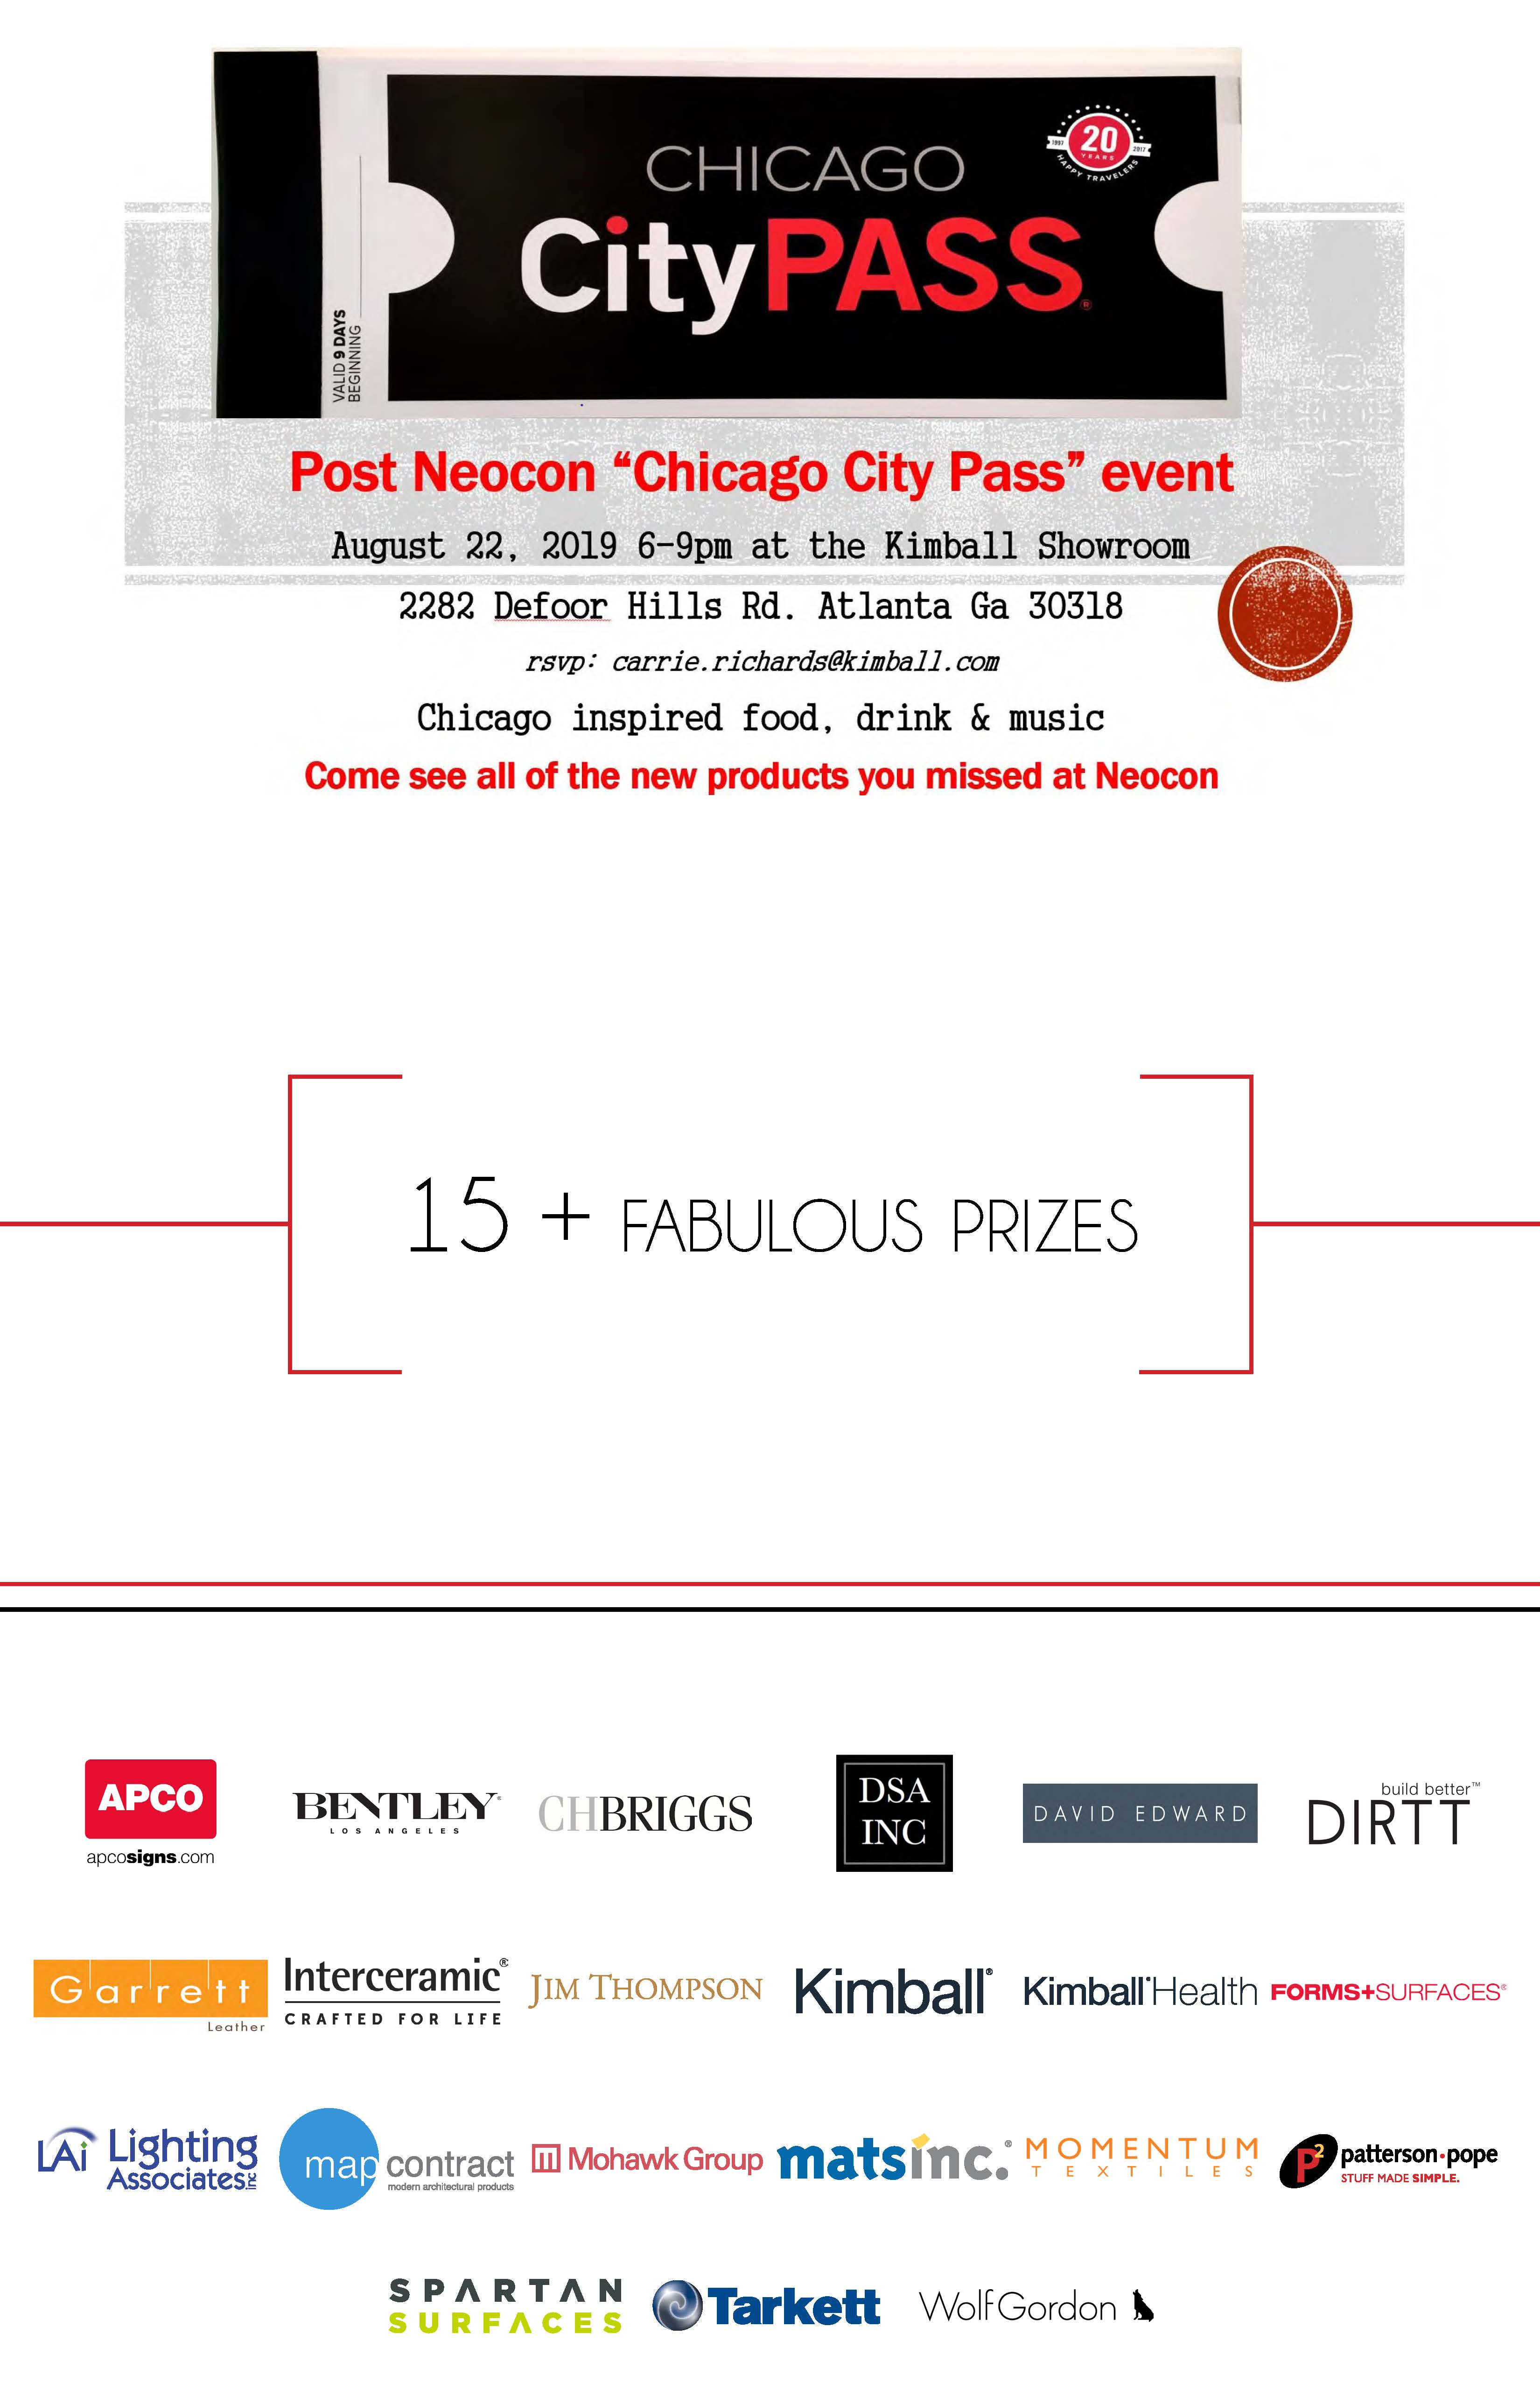 Chicago City Pass evite.jpg